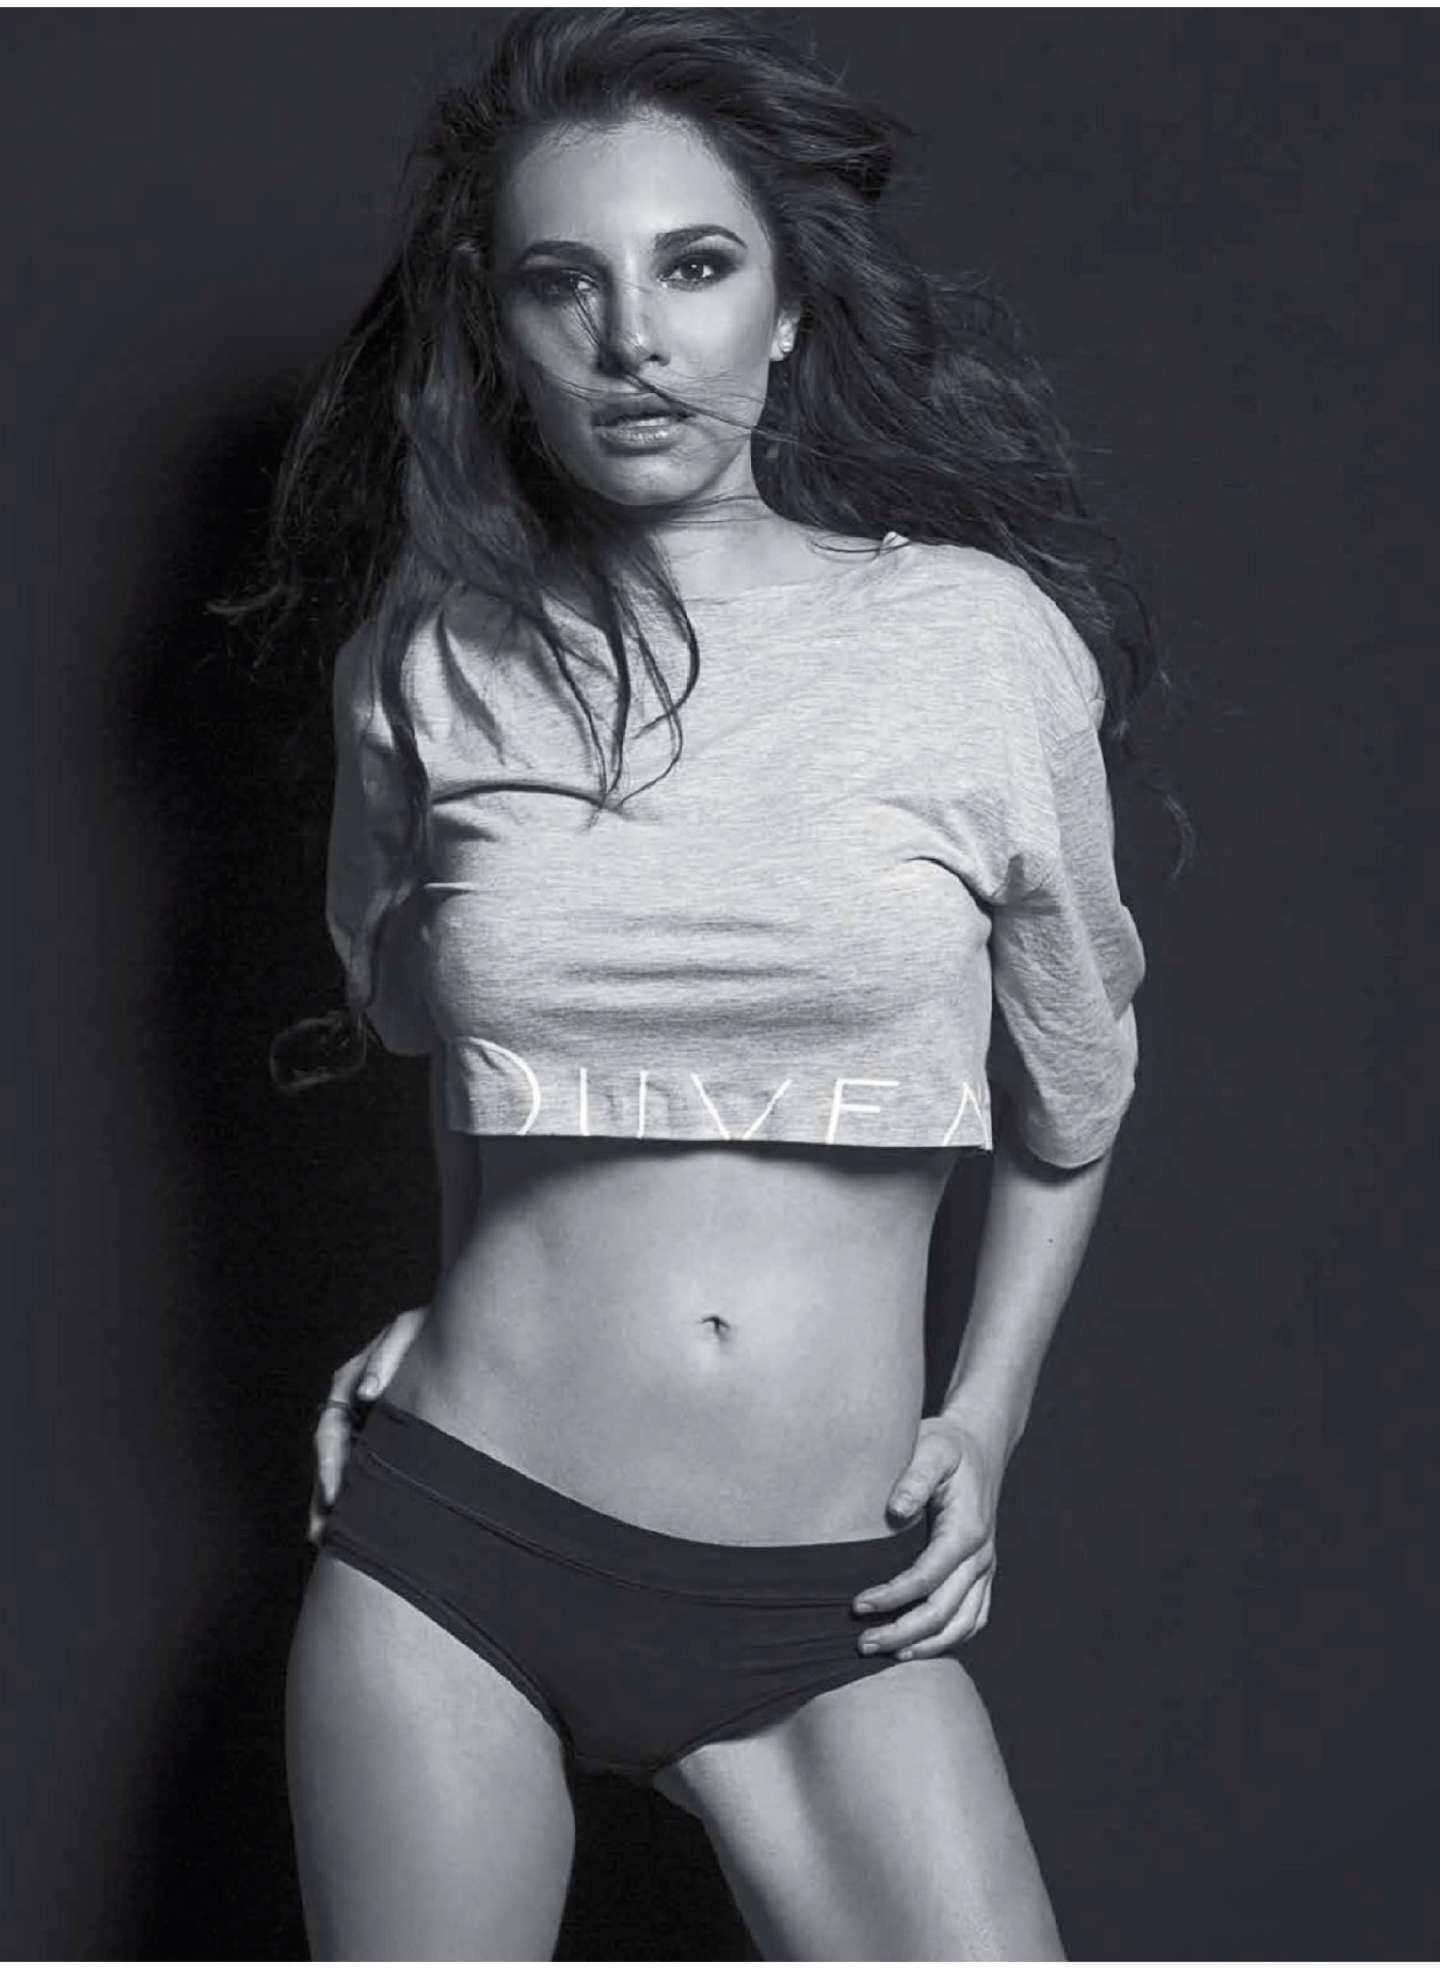 Марта Игареда черно-белое фото в топе